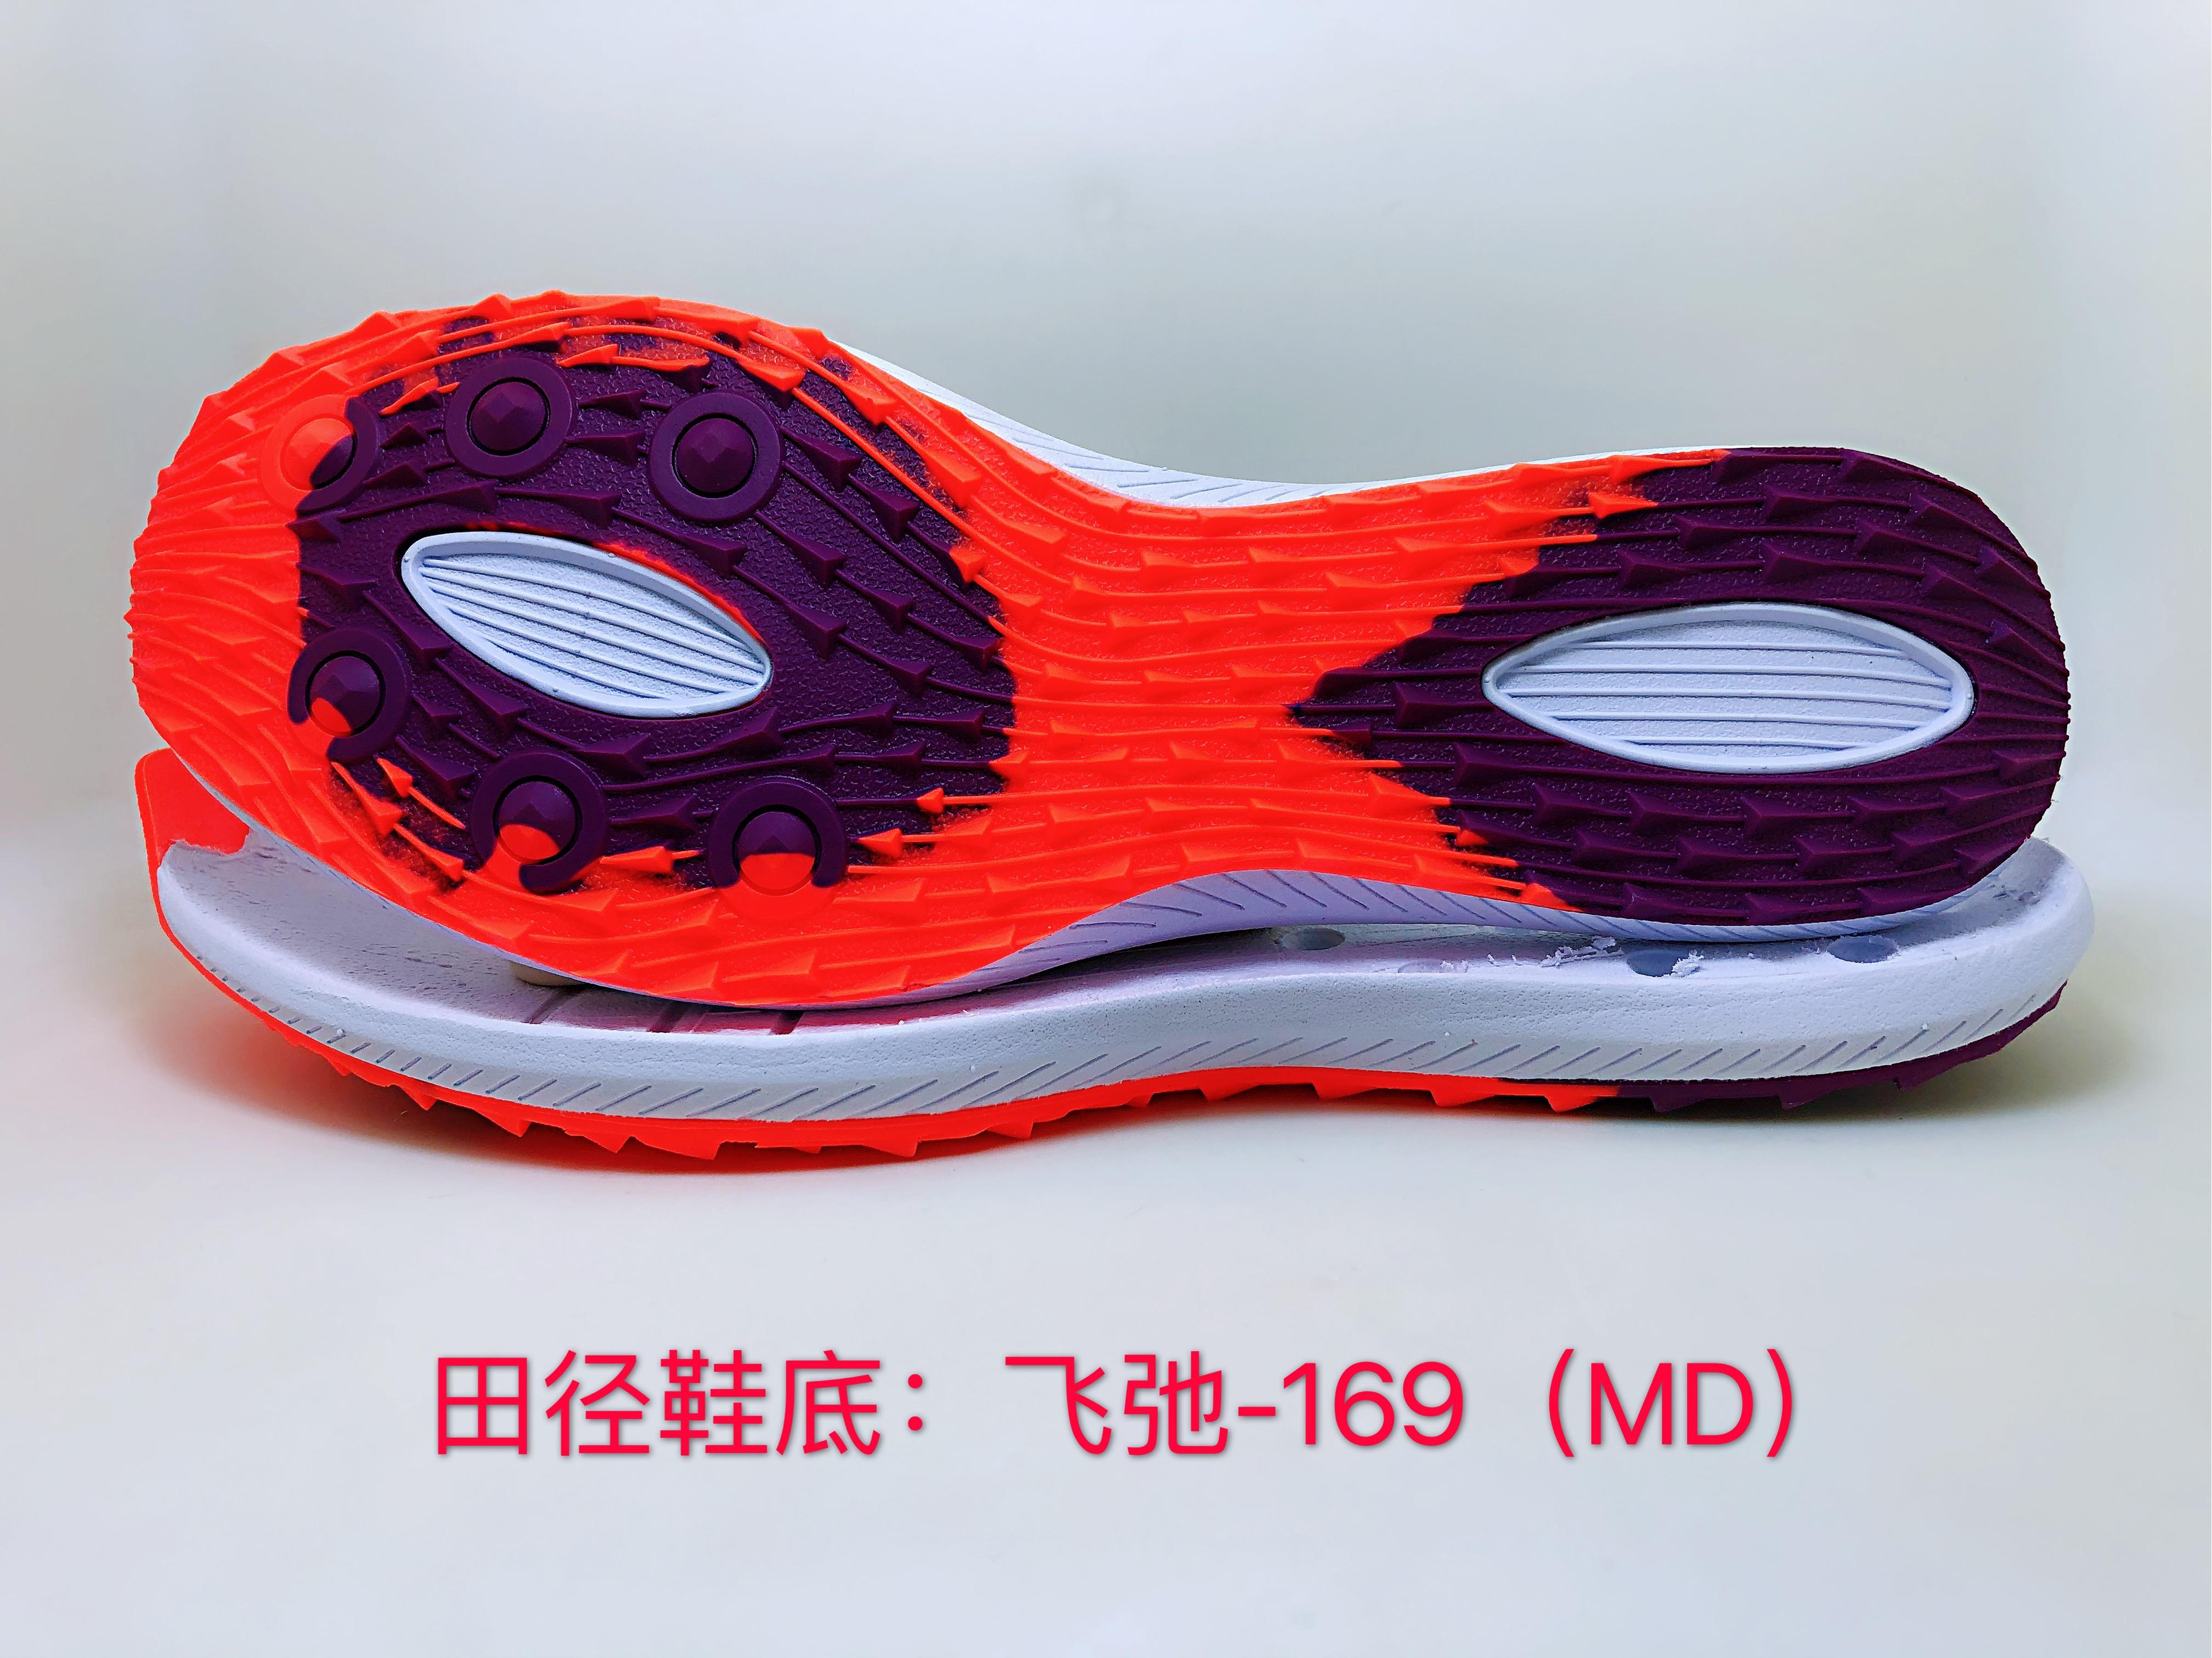 FC-169MD:  41